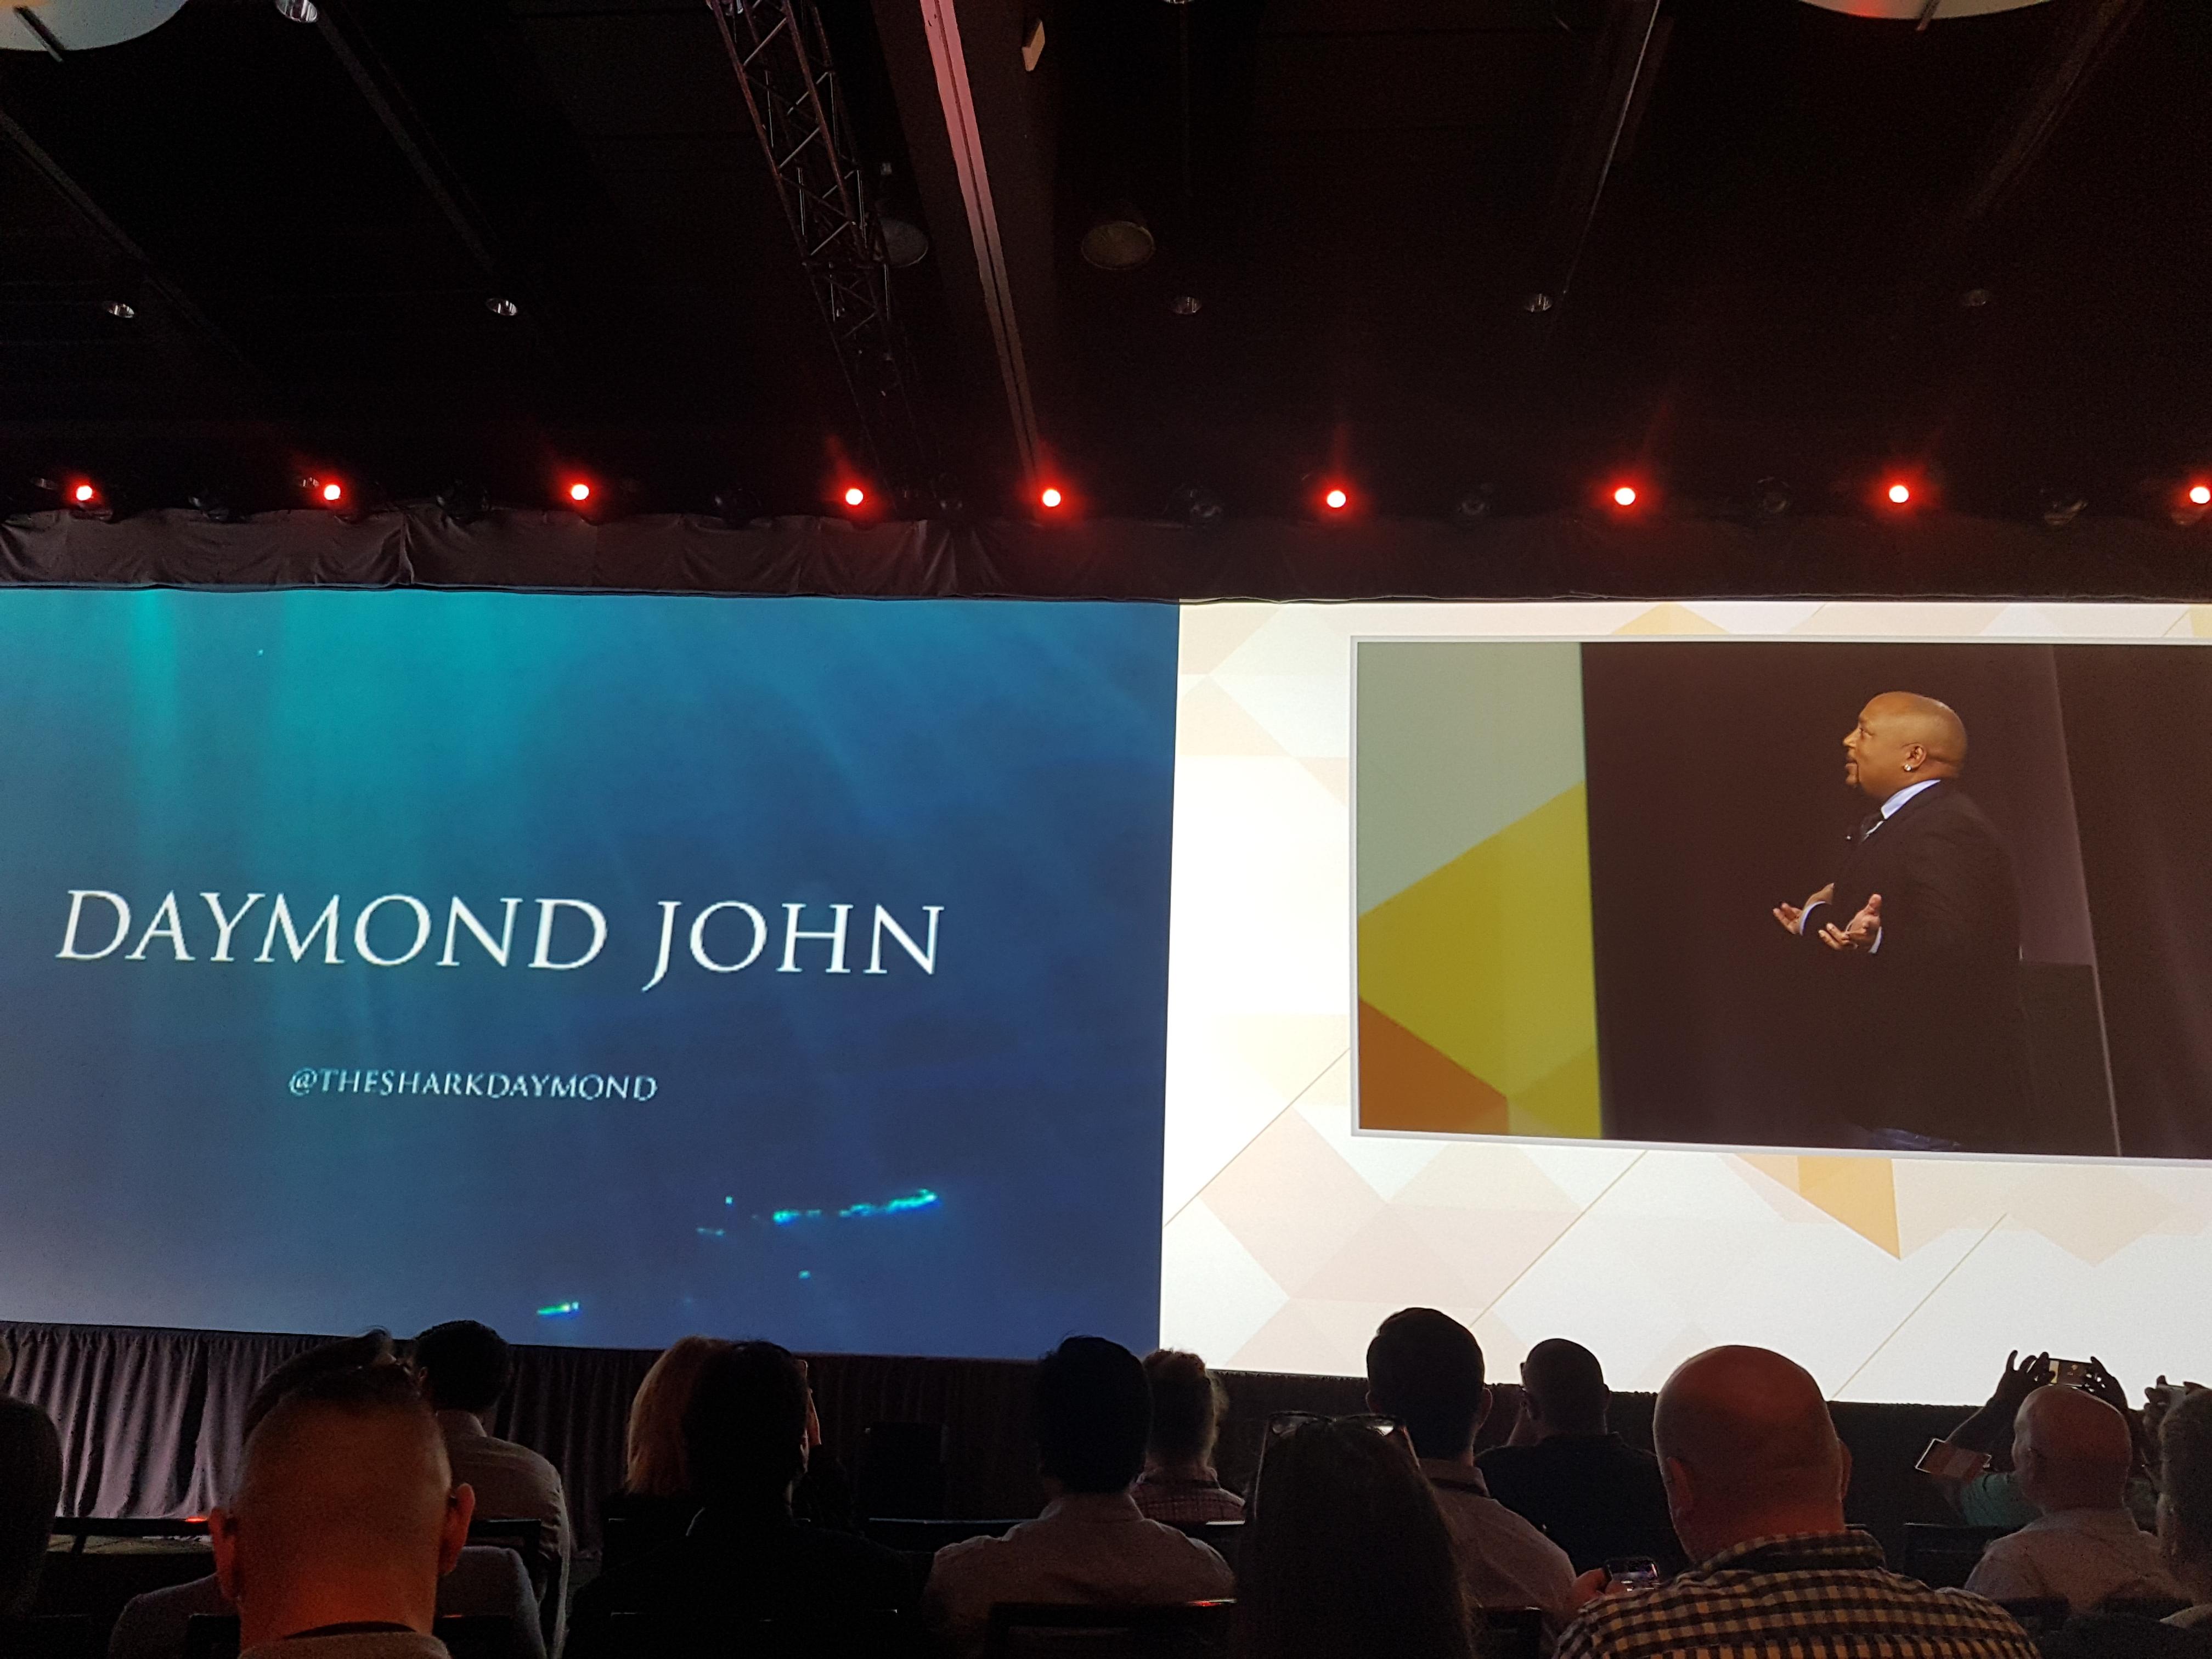 Daymond John at Sitecore Symposium 2018